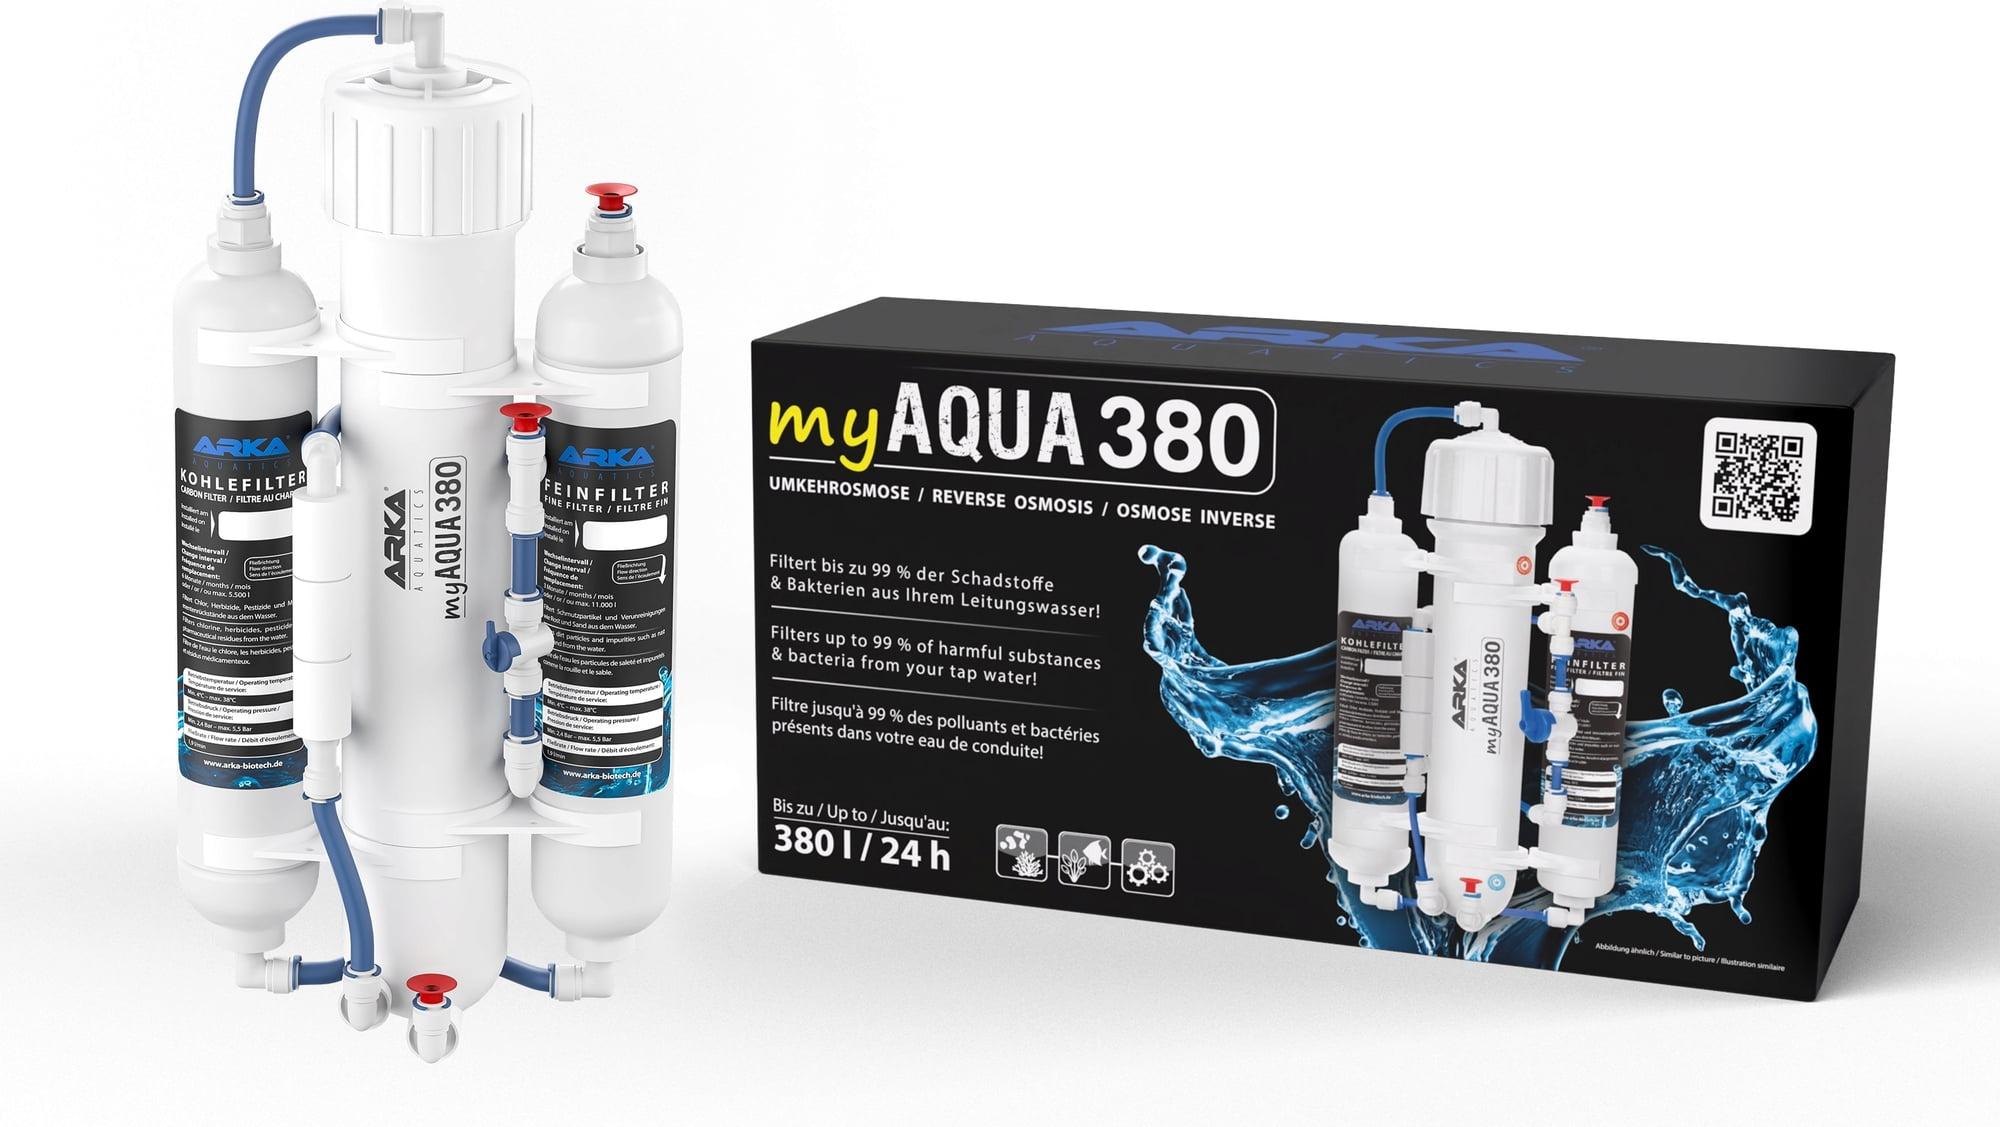 ARKA myAqua380 - Umkehrosmoseanlage bis zu 380 l/Tag